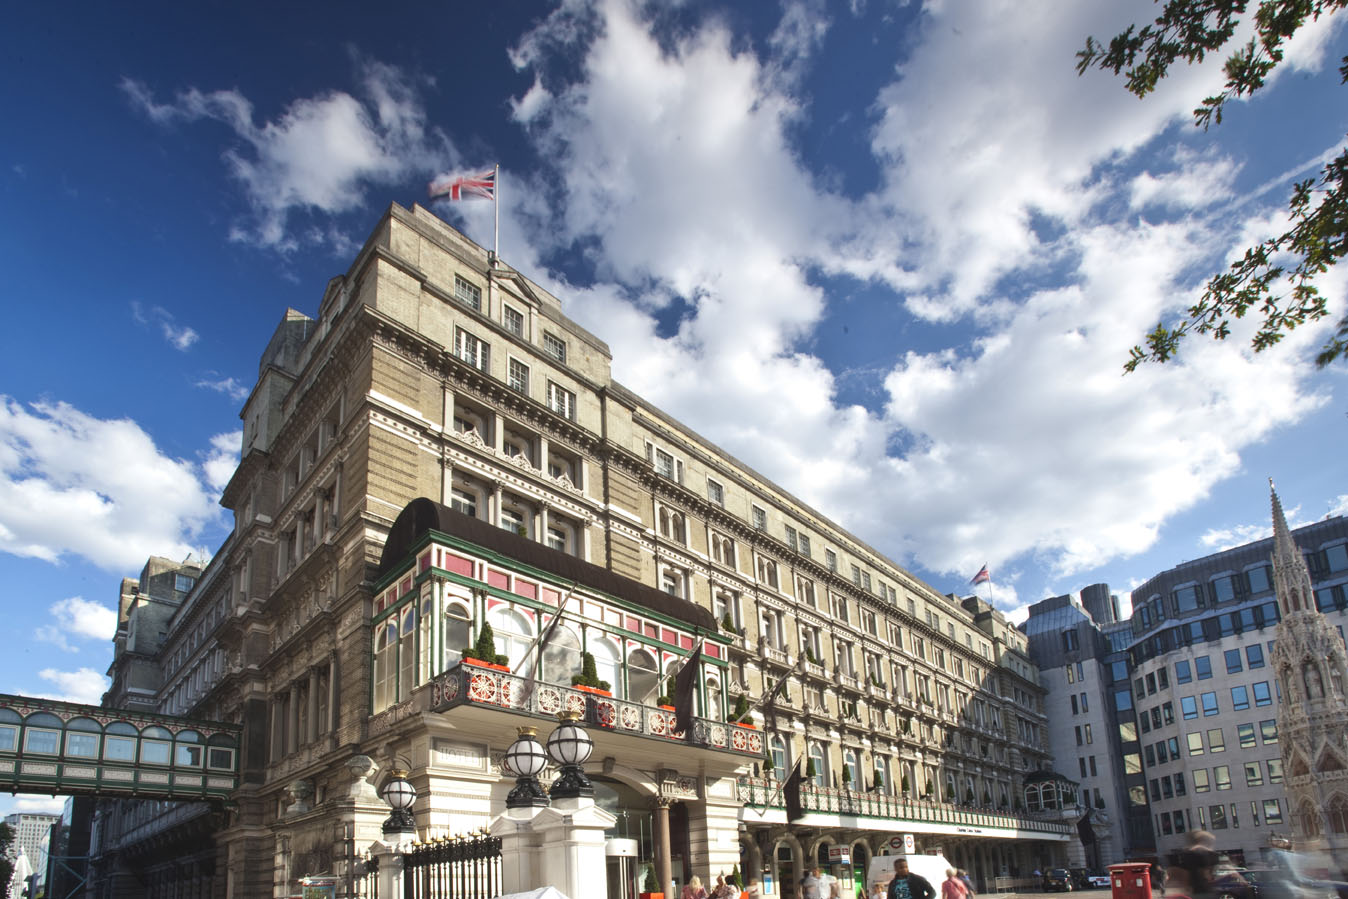 Amba Hotel Charing Cross Review